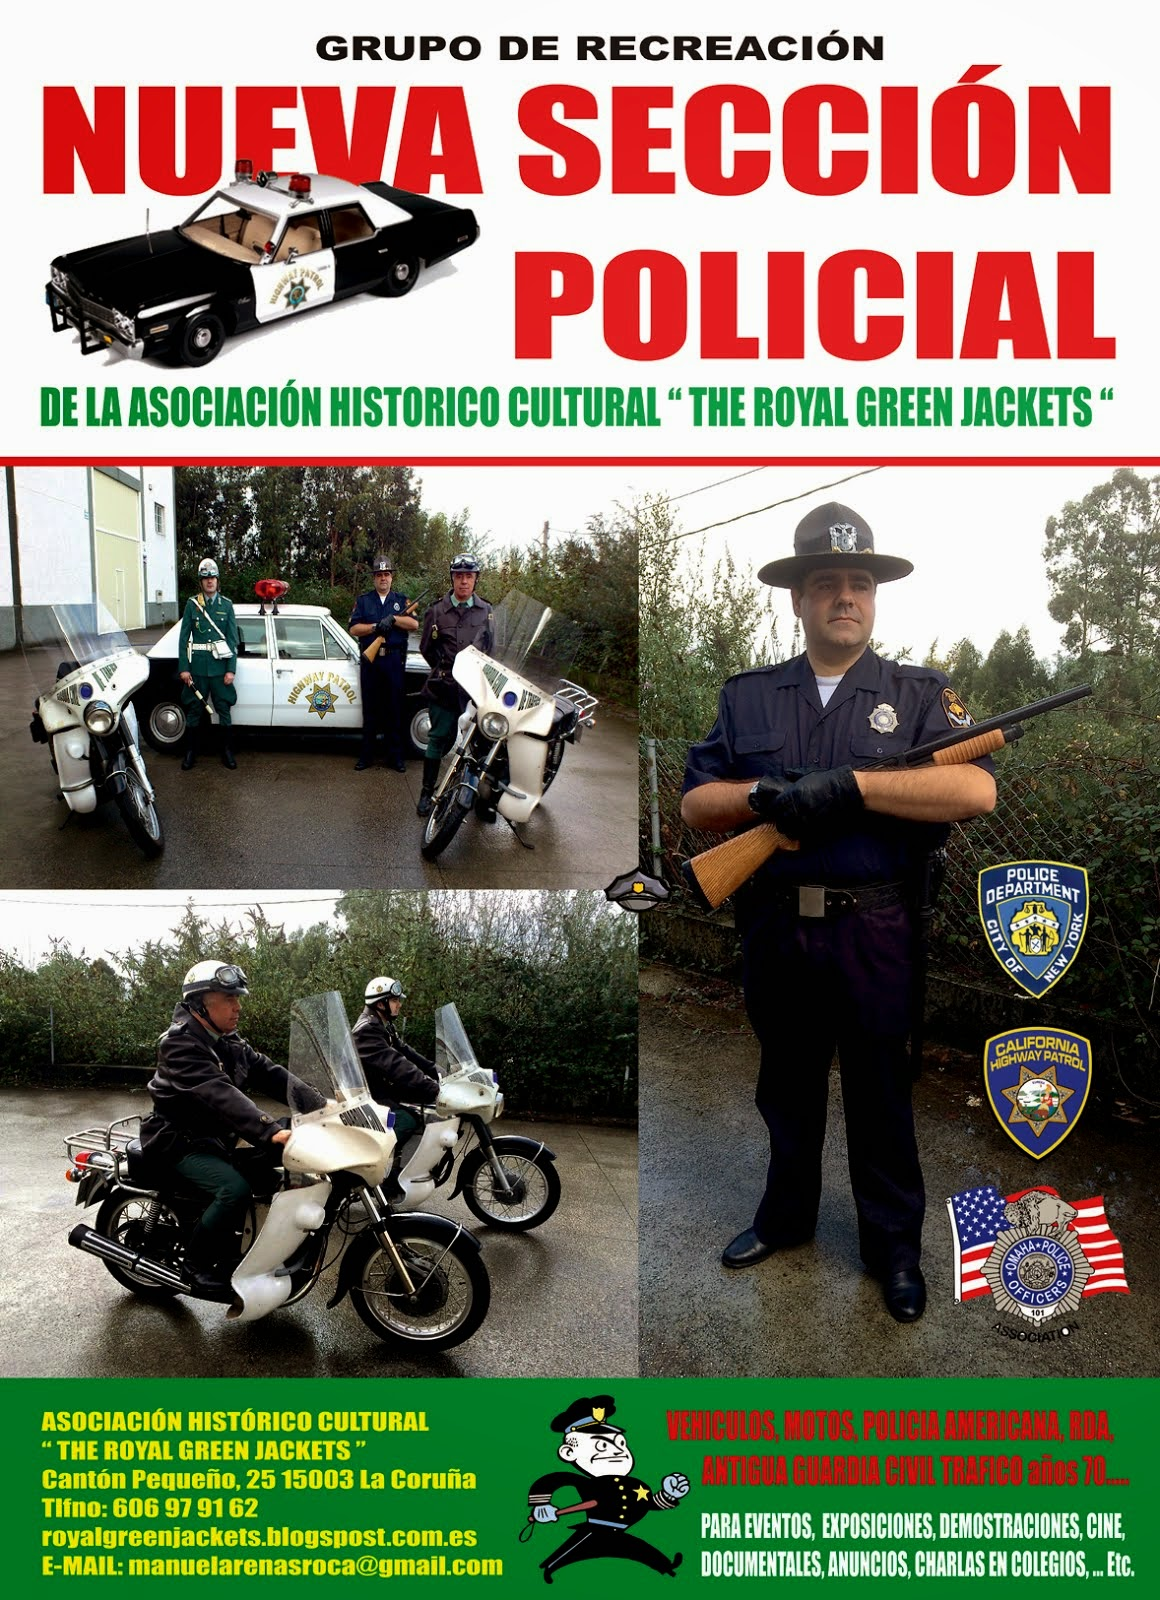 NUEVA SECCIÓN POLICIAL - GRUPO DE RECREACIÓN